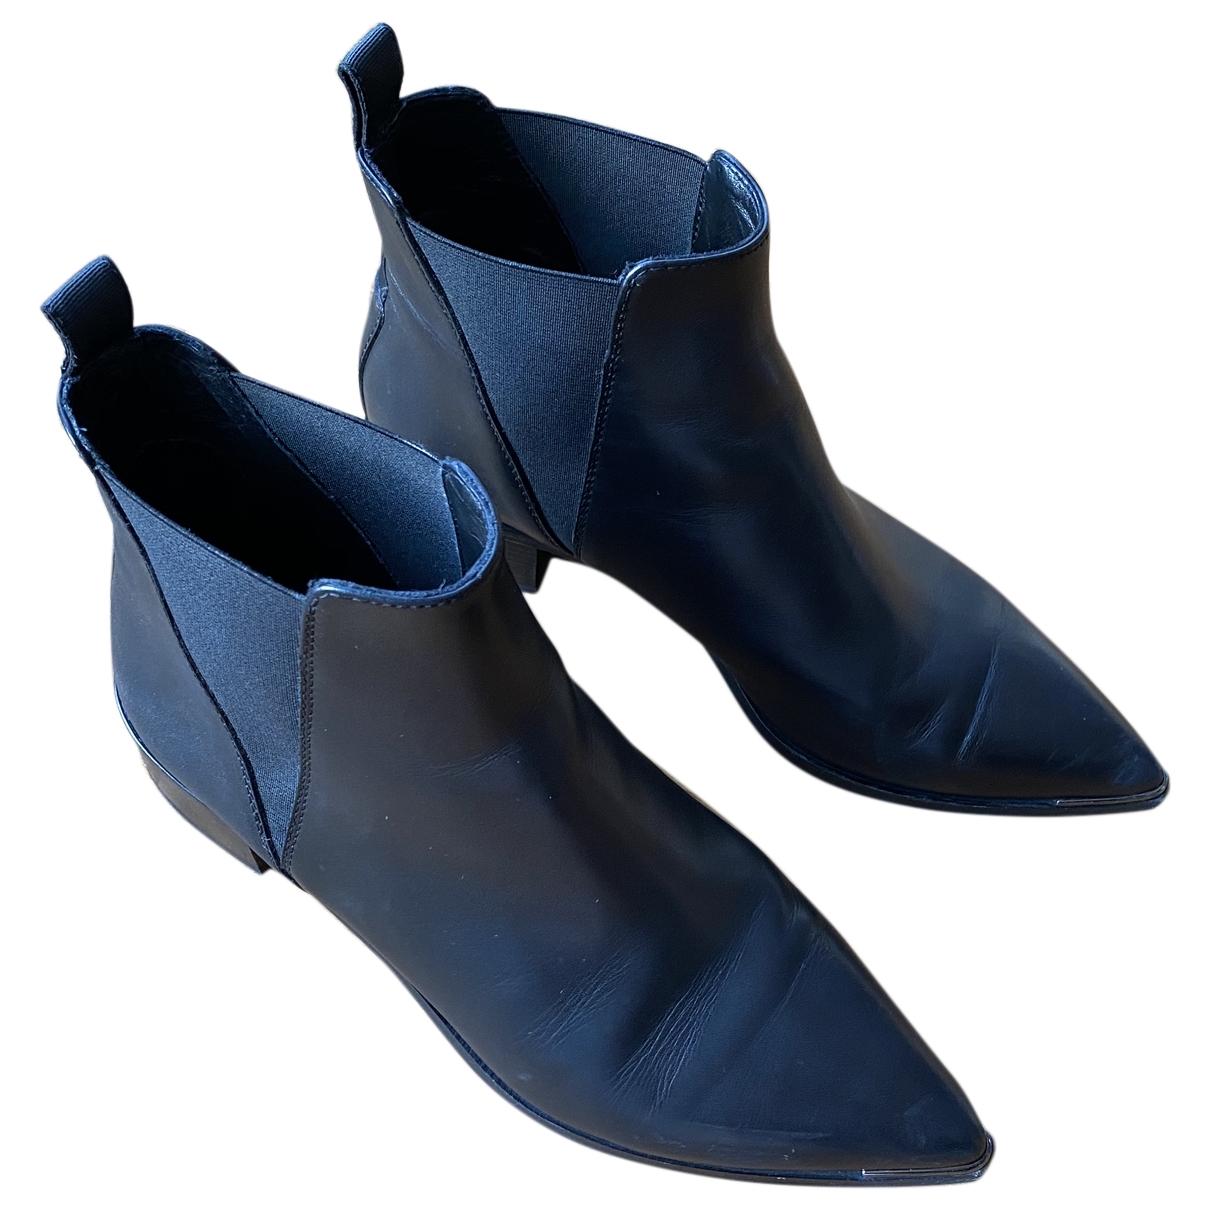 Acne Studios Jensen / Jenny Black Leather Ankle boots for Women 38 EU